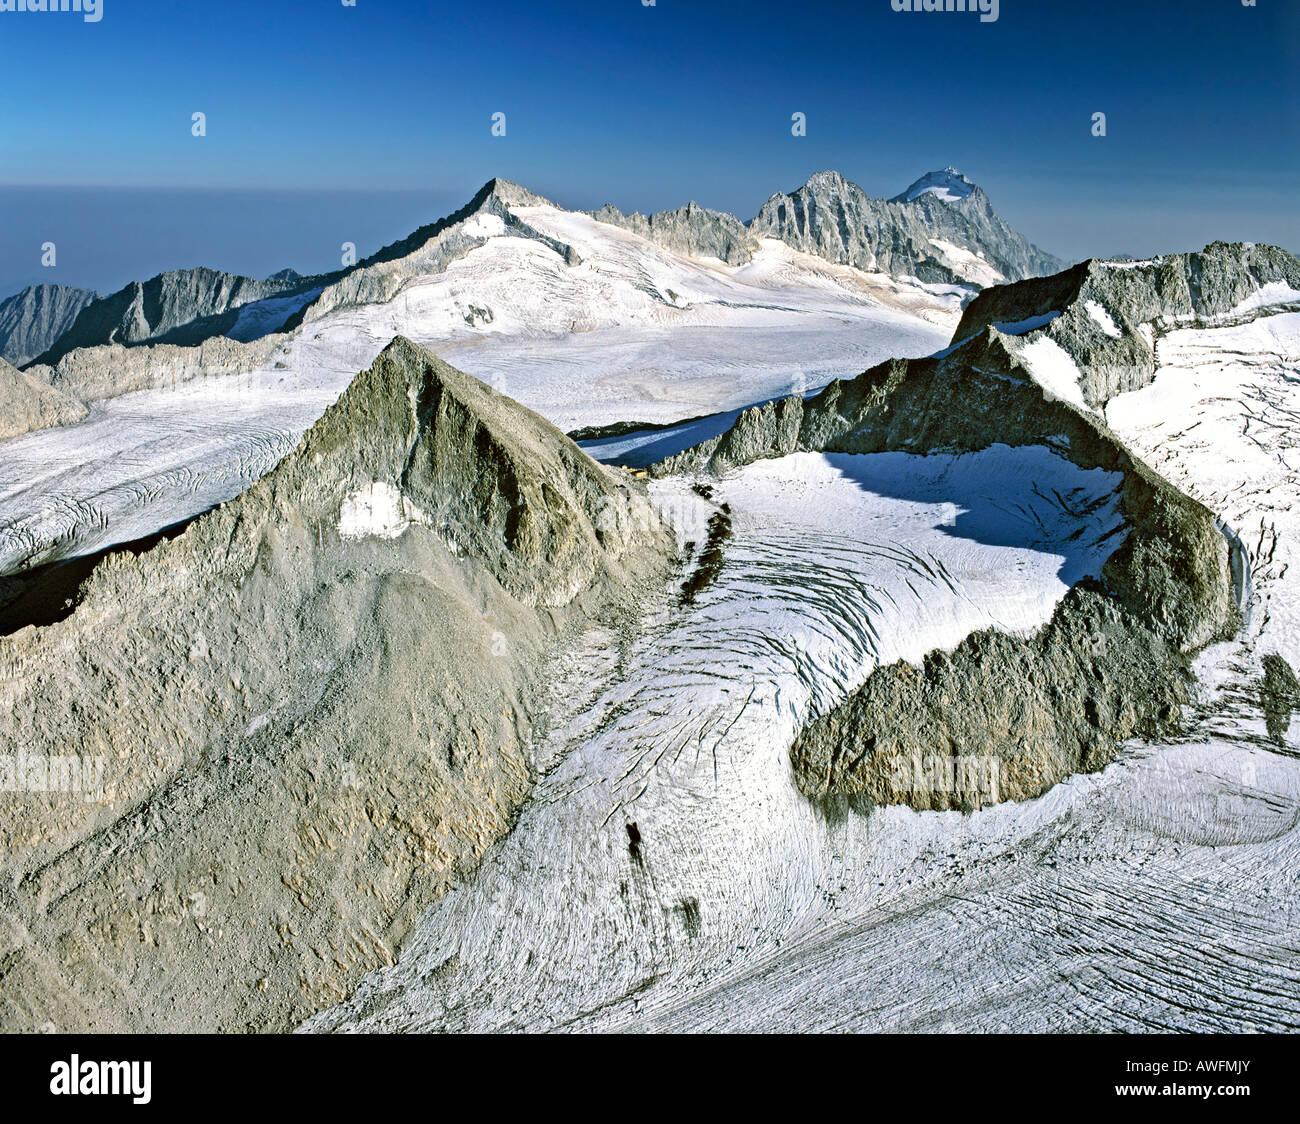 Glacier, Adamello-Presanella Group, Monte Madrone, Lombardy, Eastern Alps, Italy, Europe - Stock Image